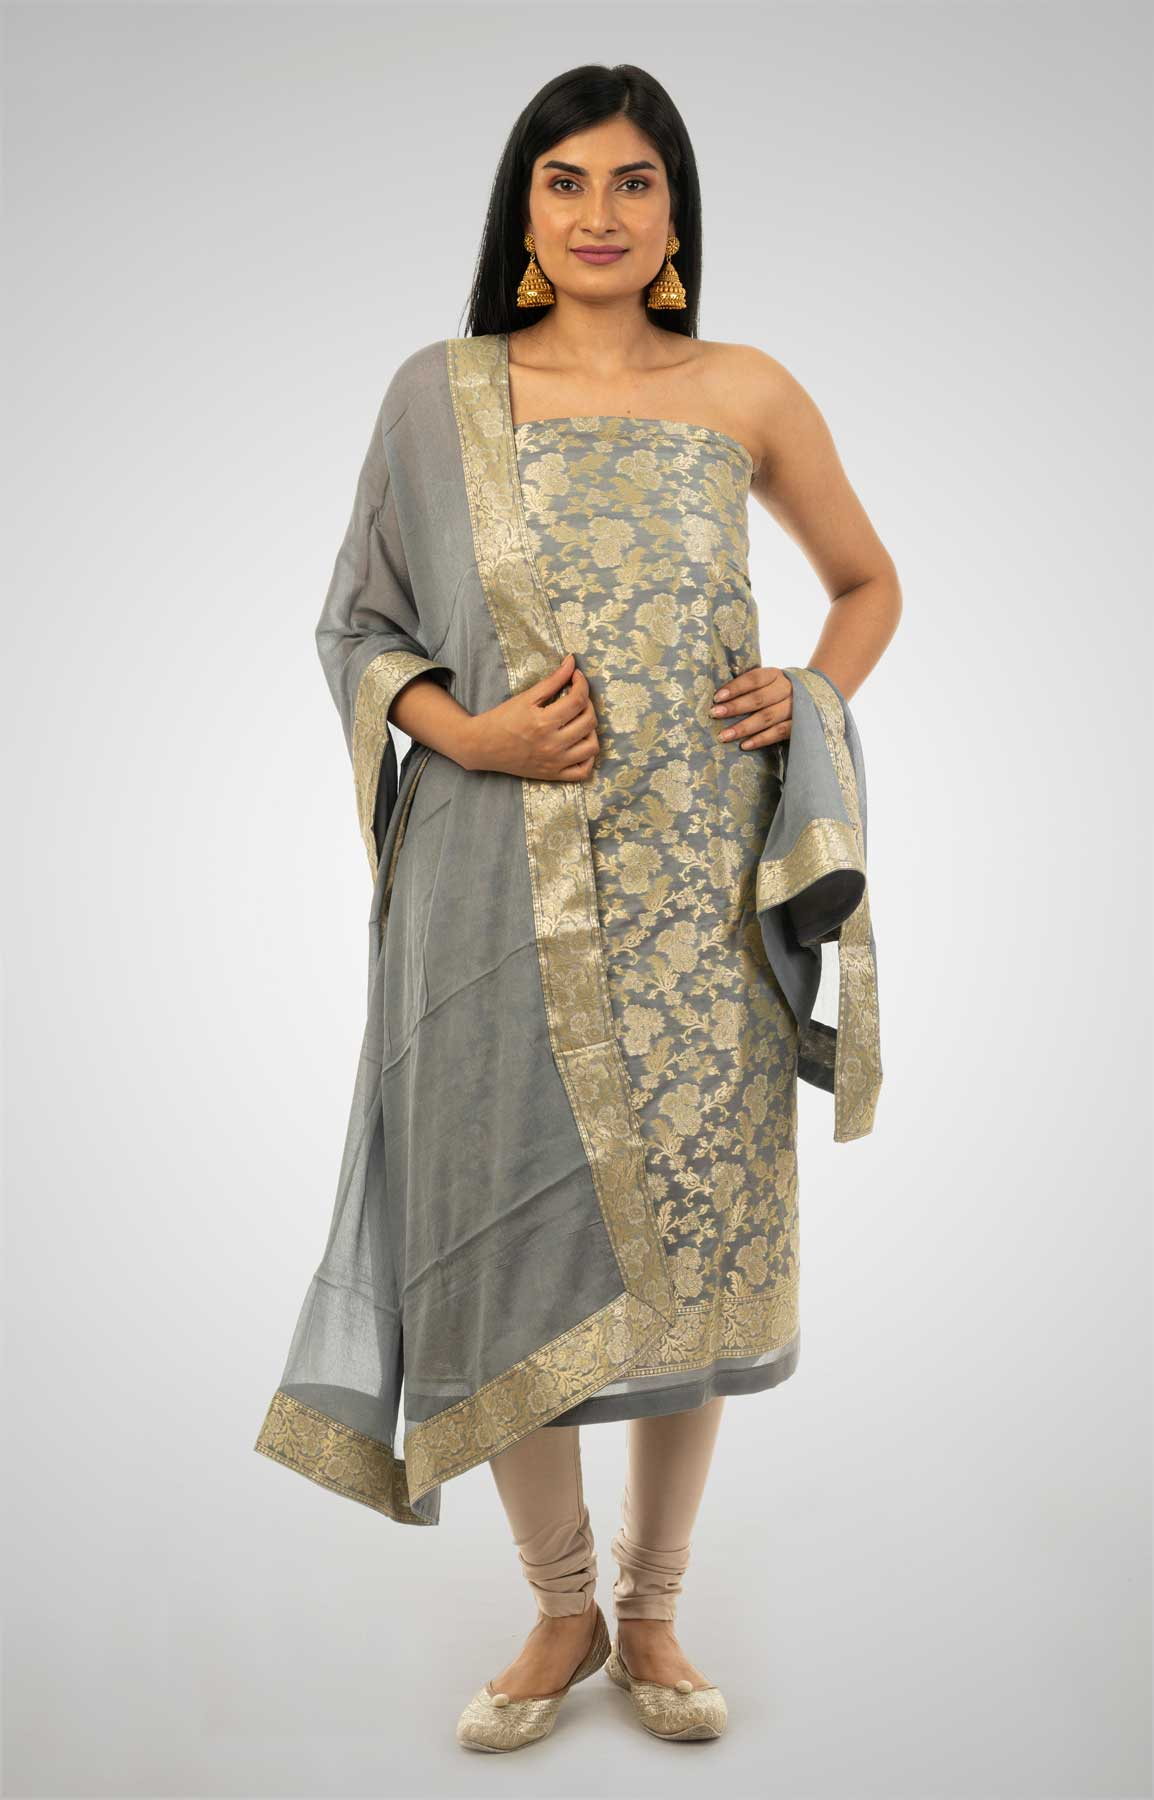 Grey Banarasi Brocade Unstitched Suit With Chiffon Dupatta – Viraaya By Ushnakmals